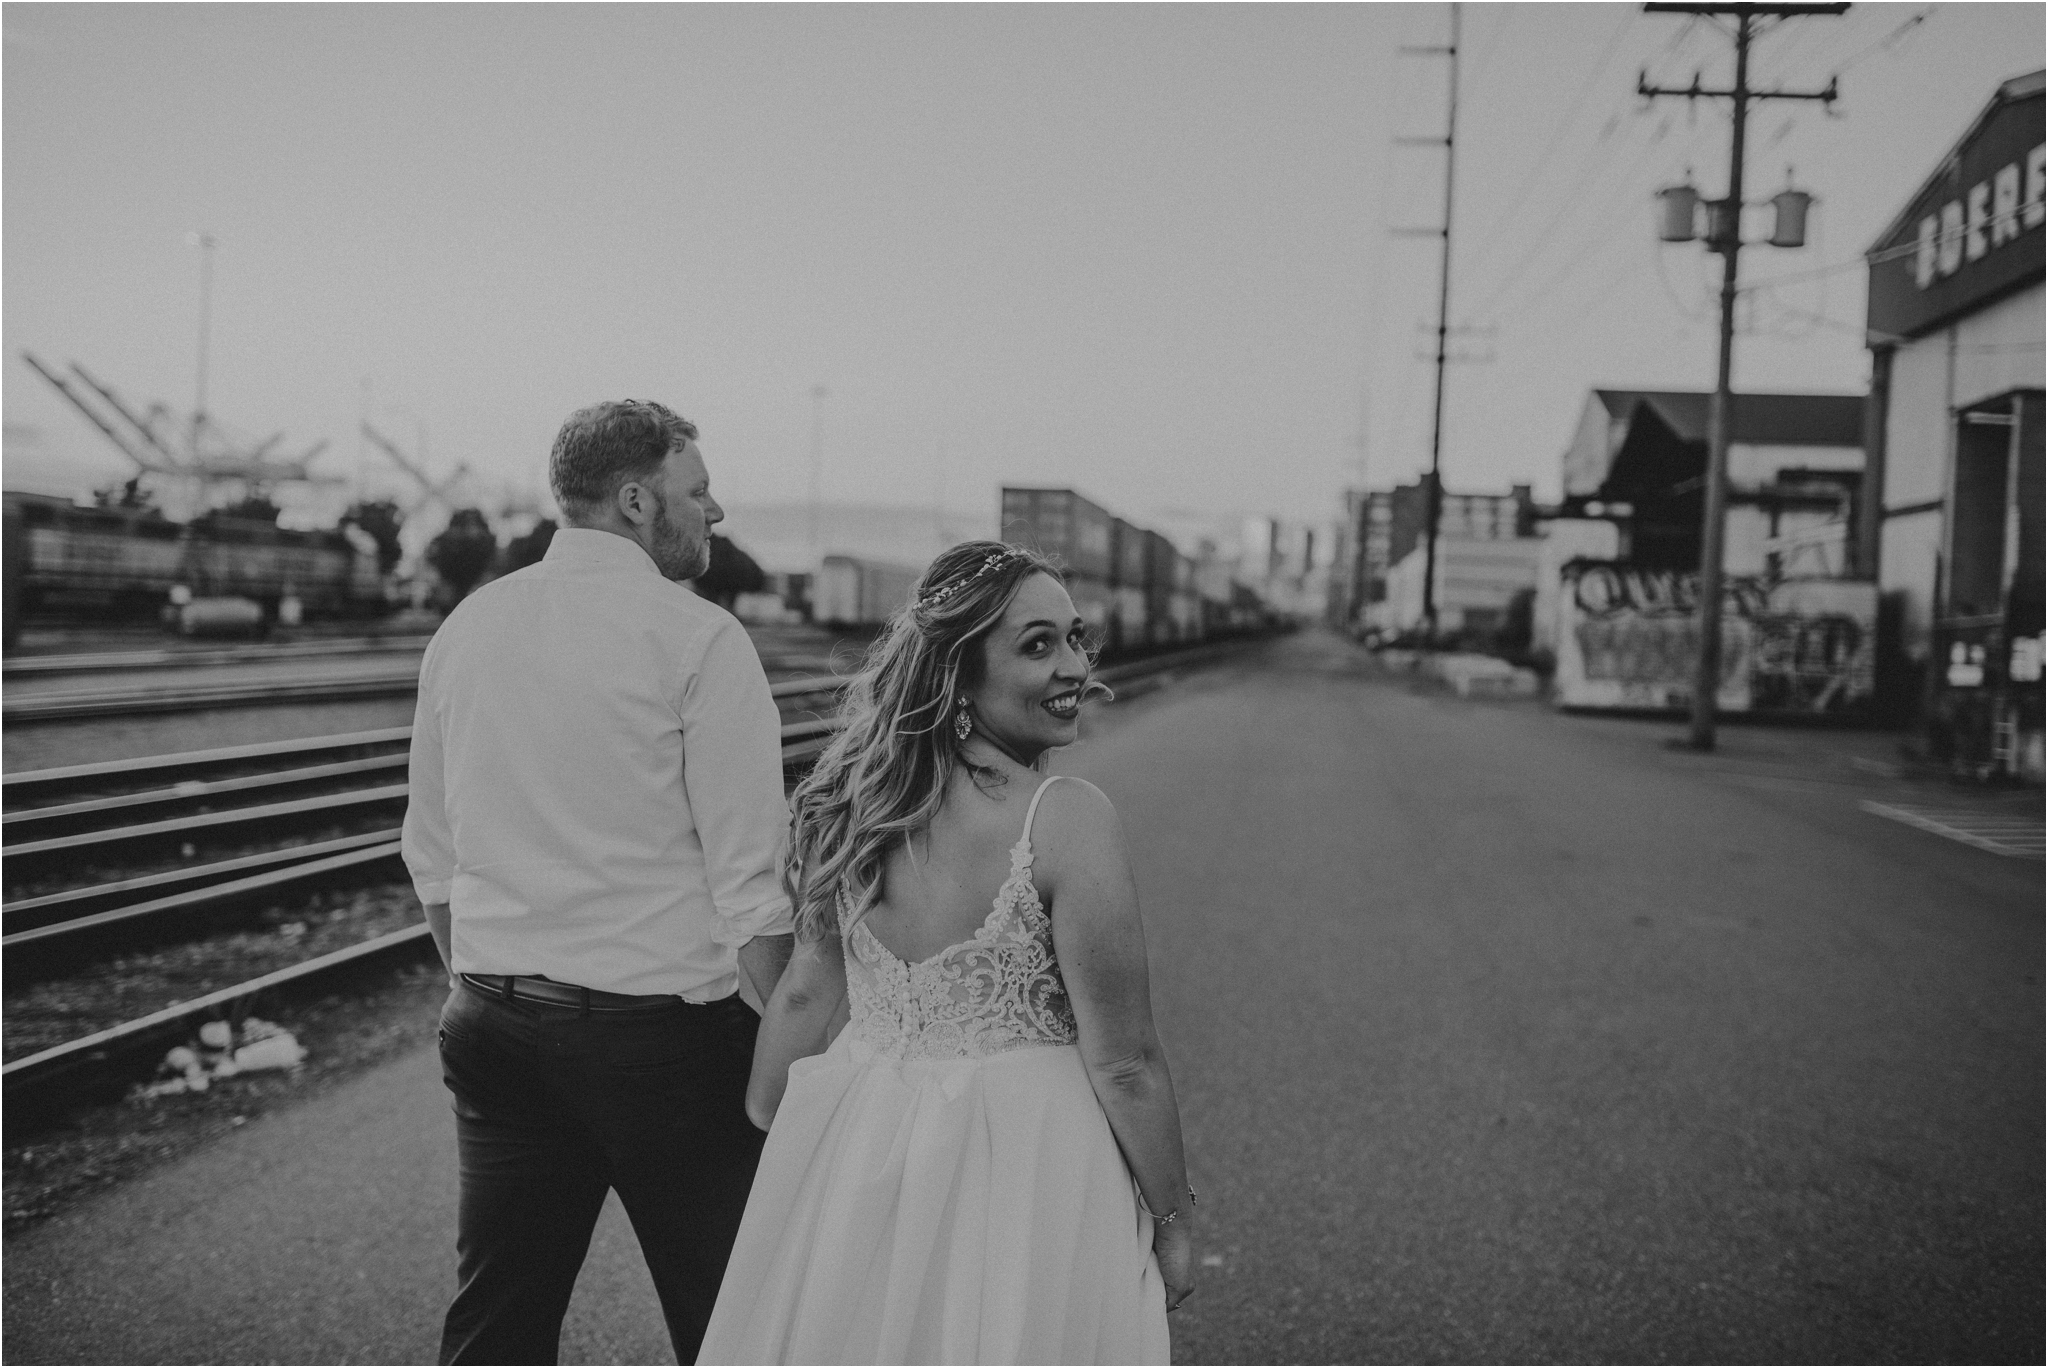 laura-and-matt-metropolist-urban-seattle-wedding-photographer-148.jpg